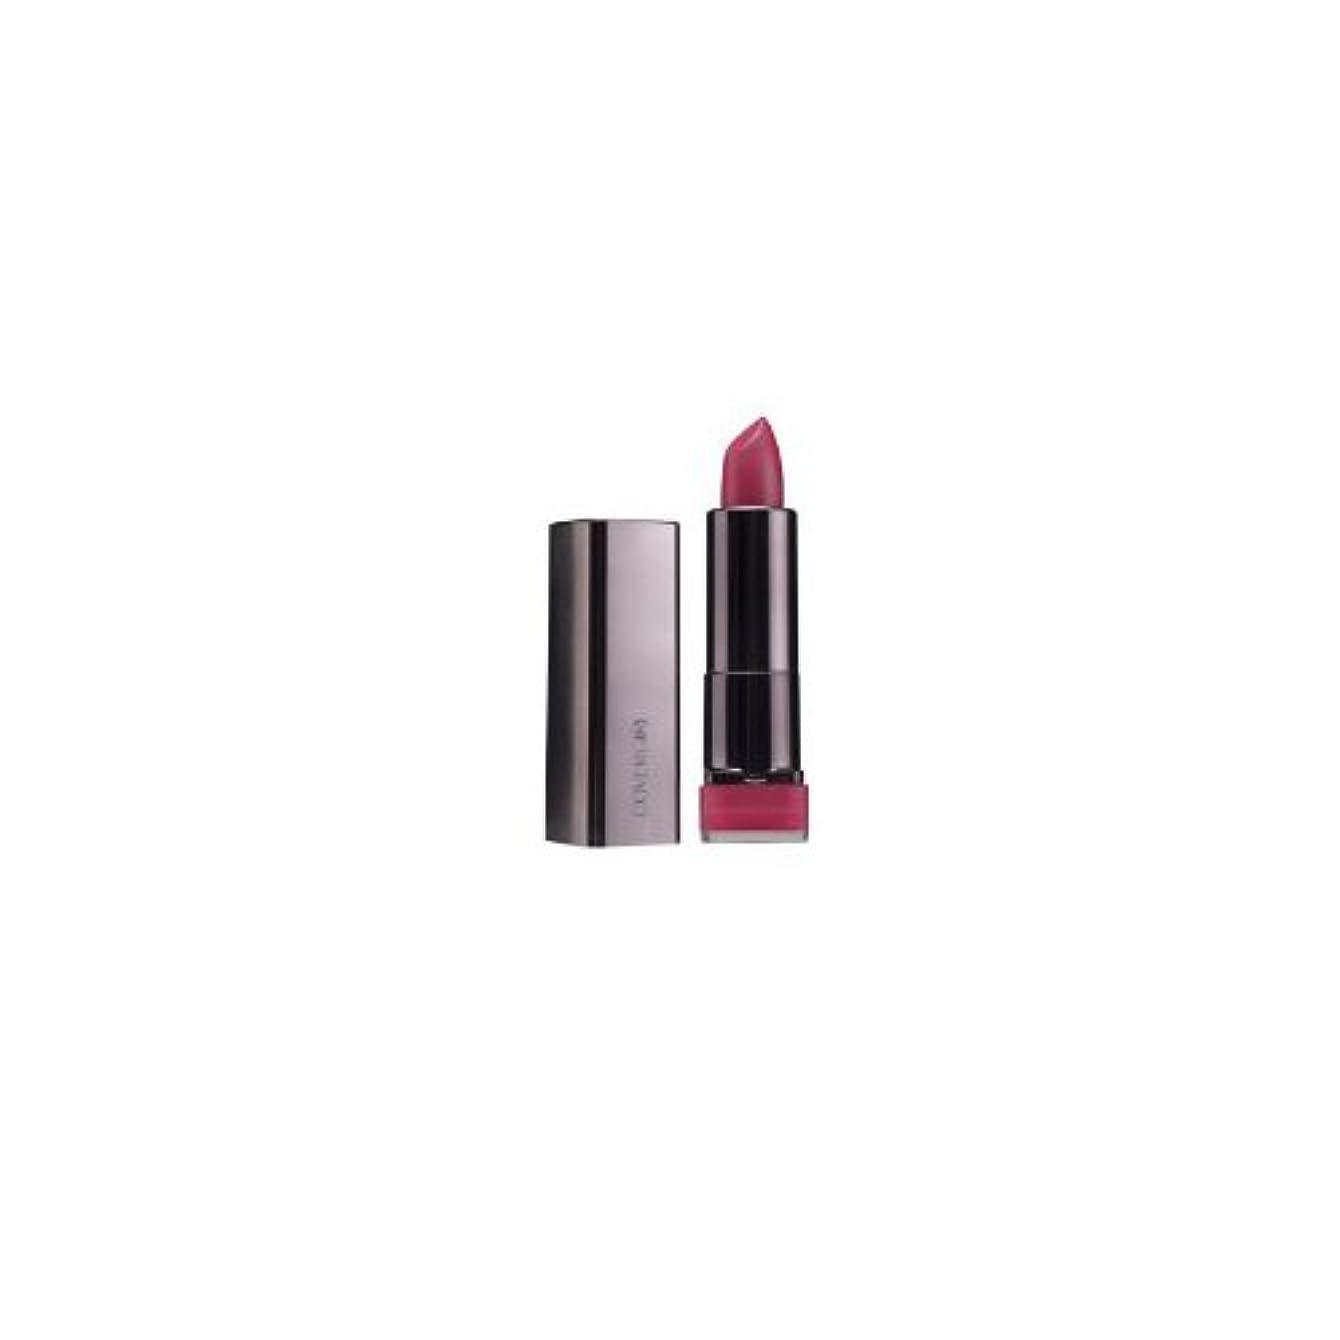 巨人満了不注意Covergirl Lip Perfection Lipstick Tempt 355, 3.5 ml (2-pack) (並行輸入品)